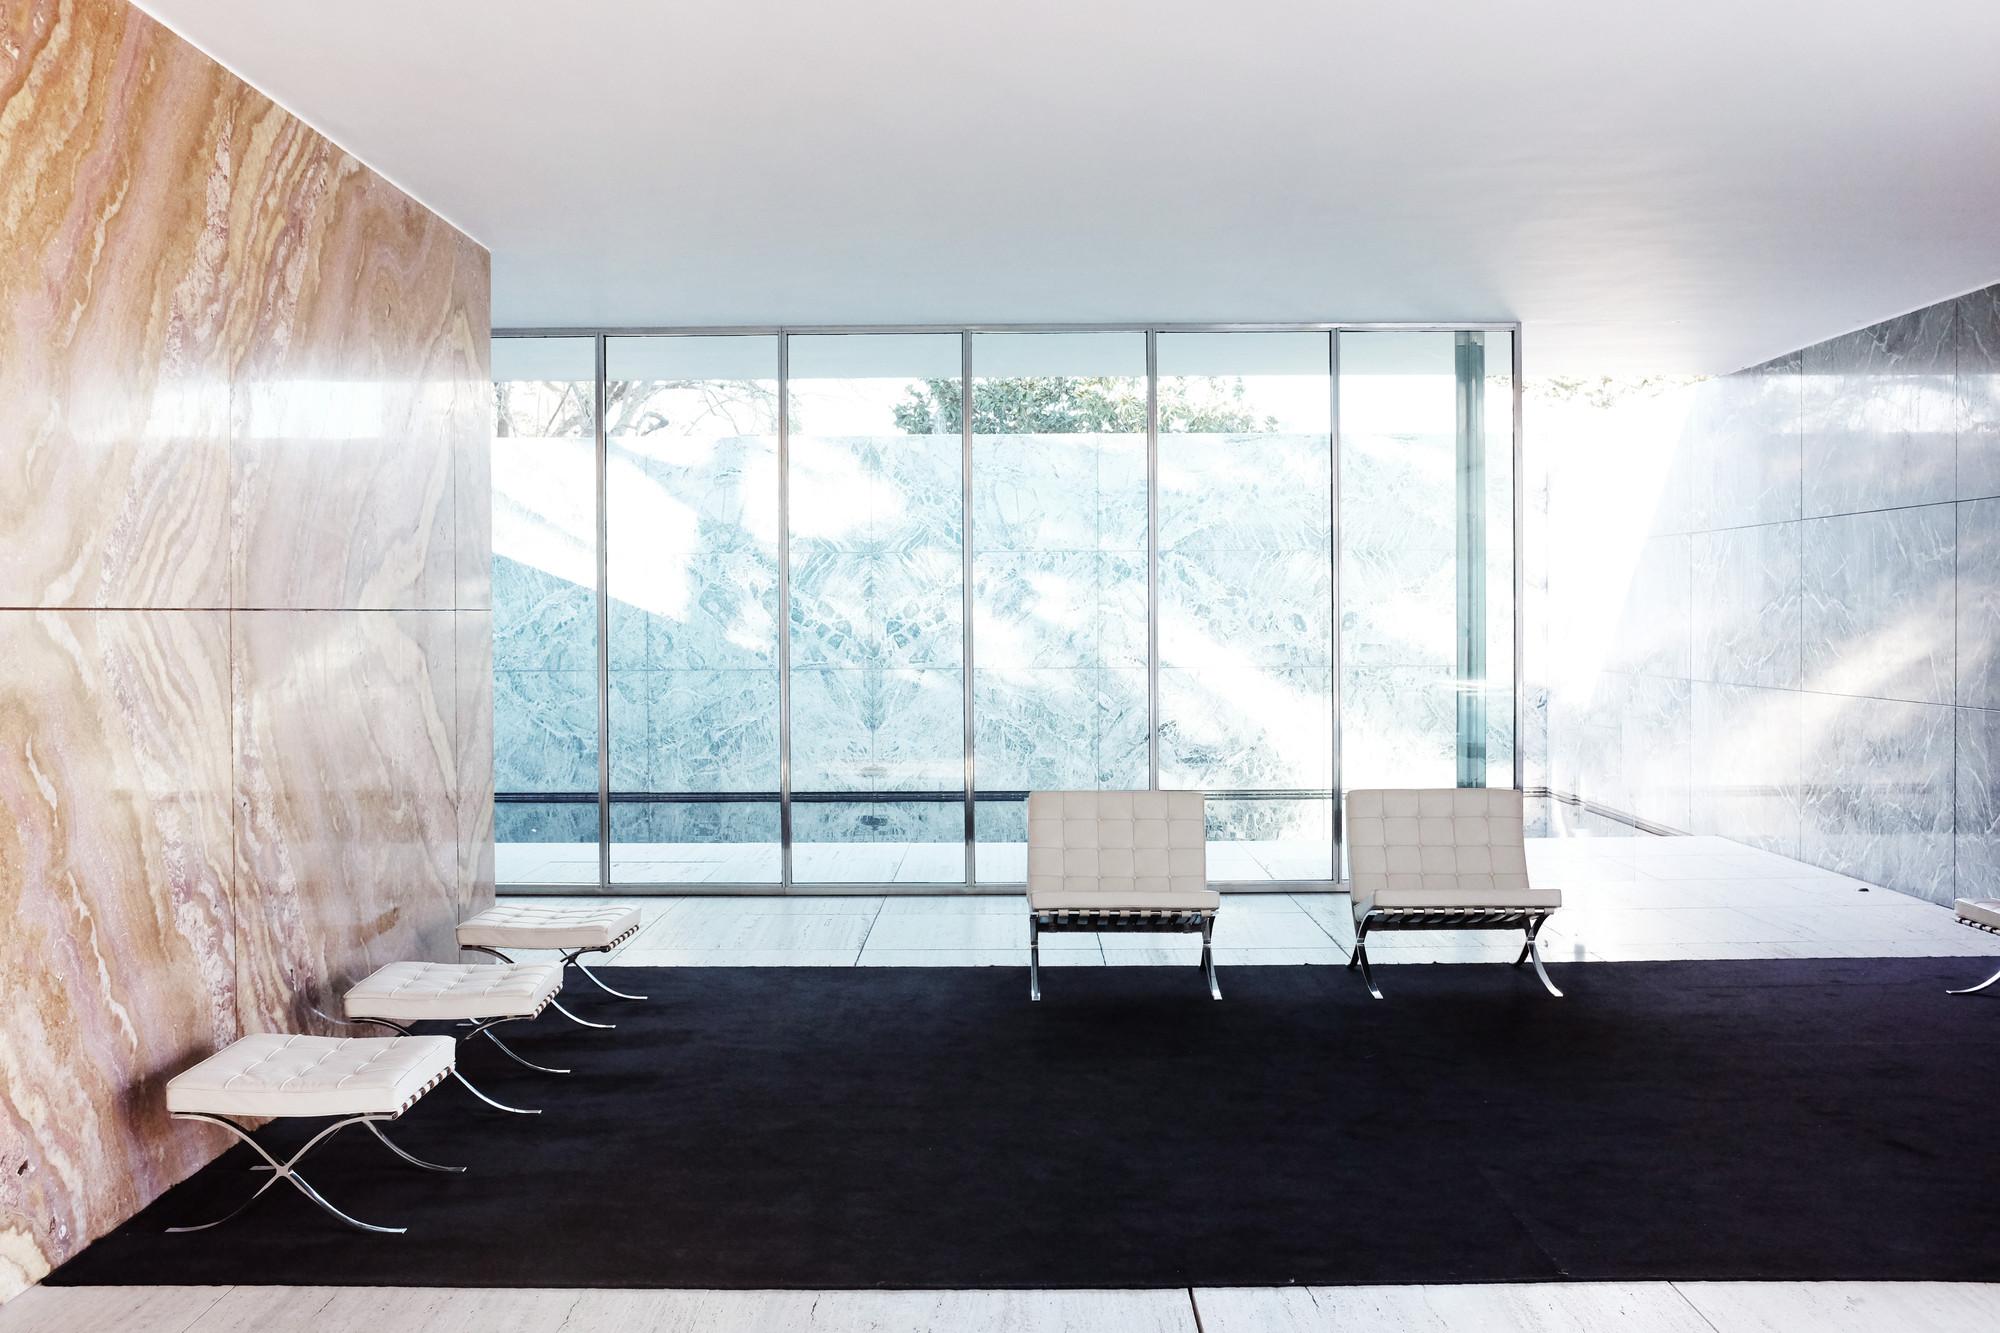 gallery of ad classics barcelona pavilion mies van der rohe 3. Black Bedroom Furniture Sets. Home Design Ideas